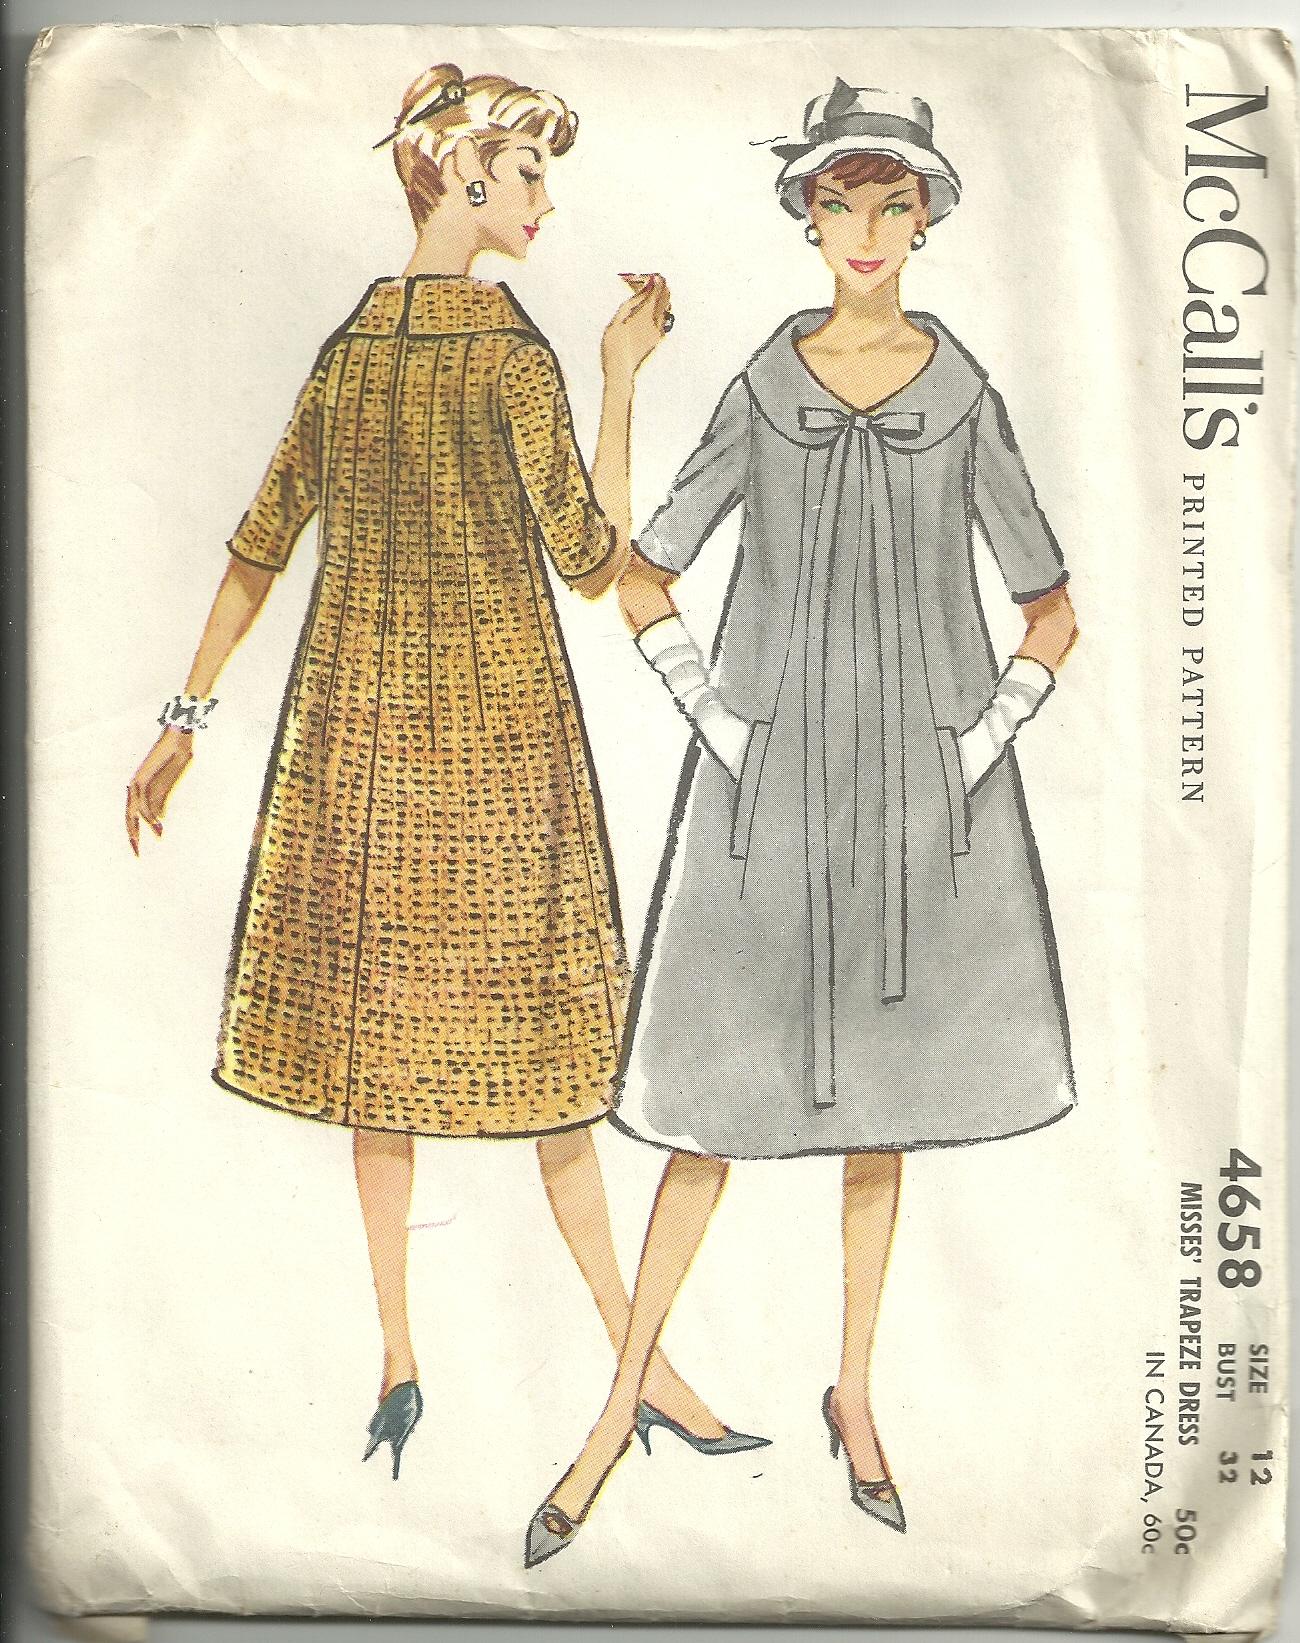 McCall's 4658 A